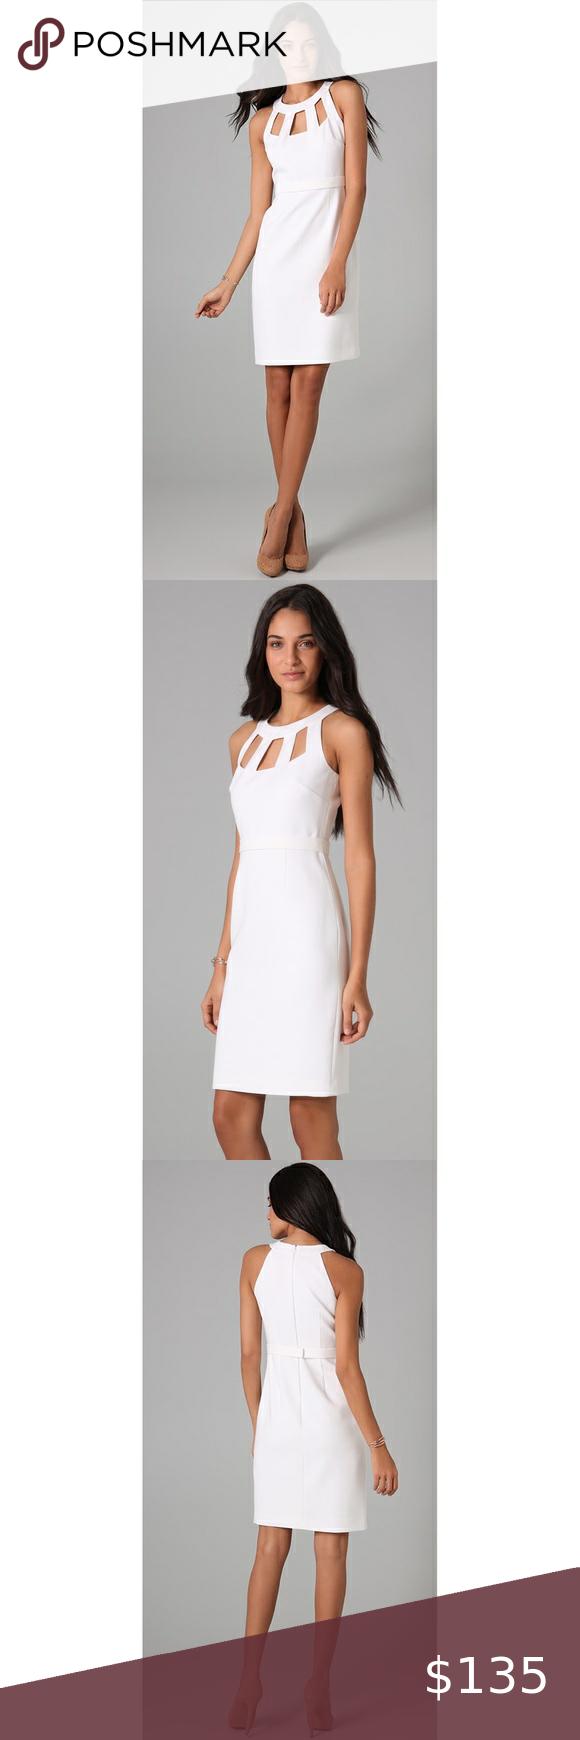 New 398 Elie Tahari White Creme Lucy Dress Dresses Lucy Dresses Elie Tahari Dresses [ 1740 x 580 Pixel ]